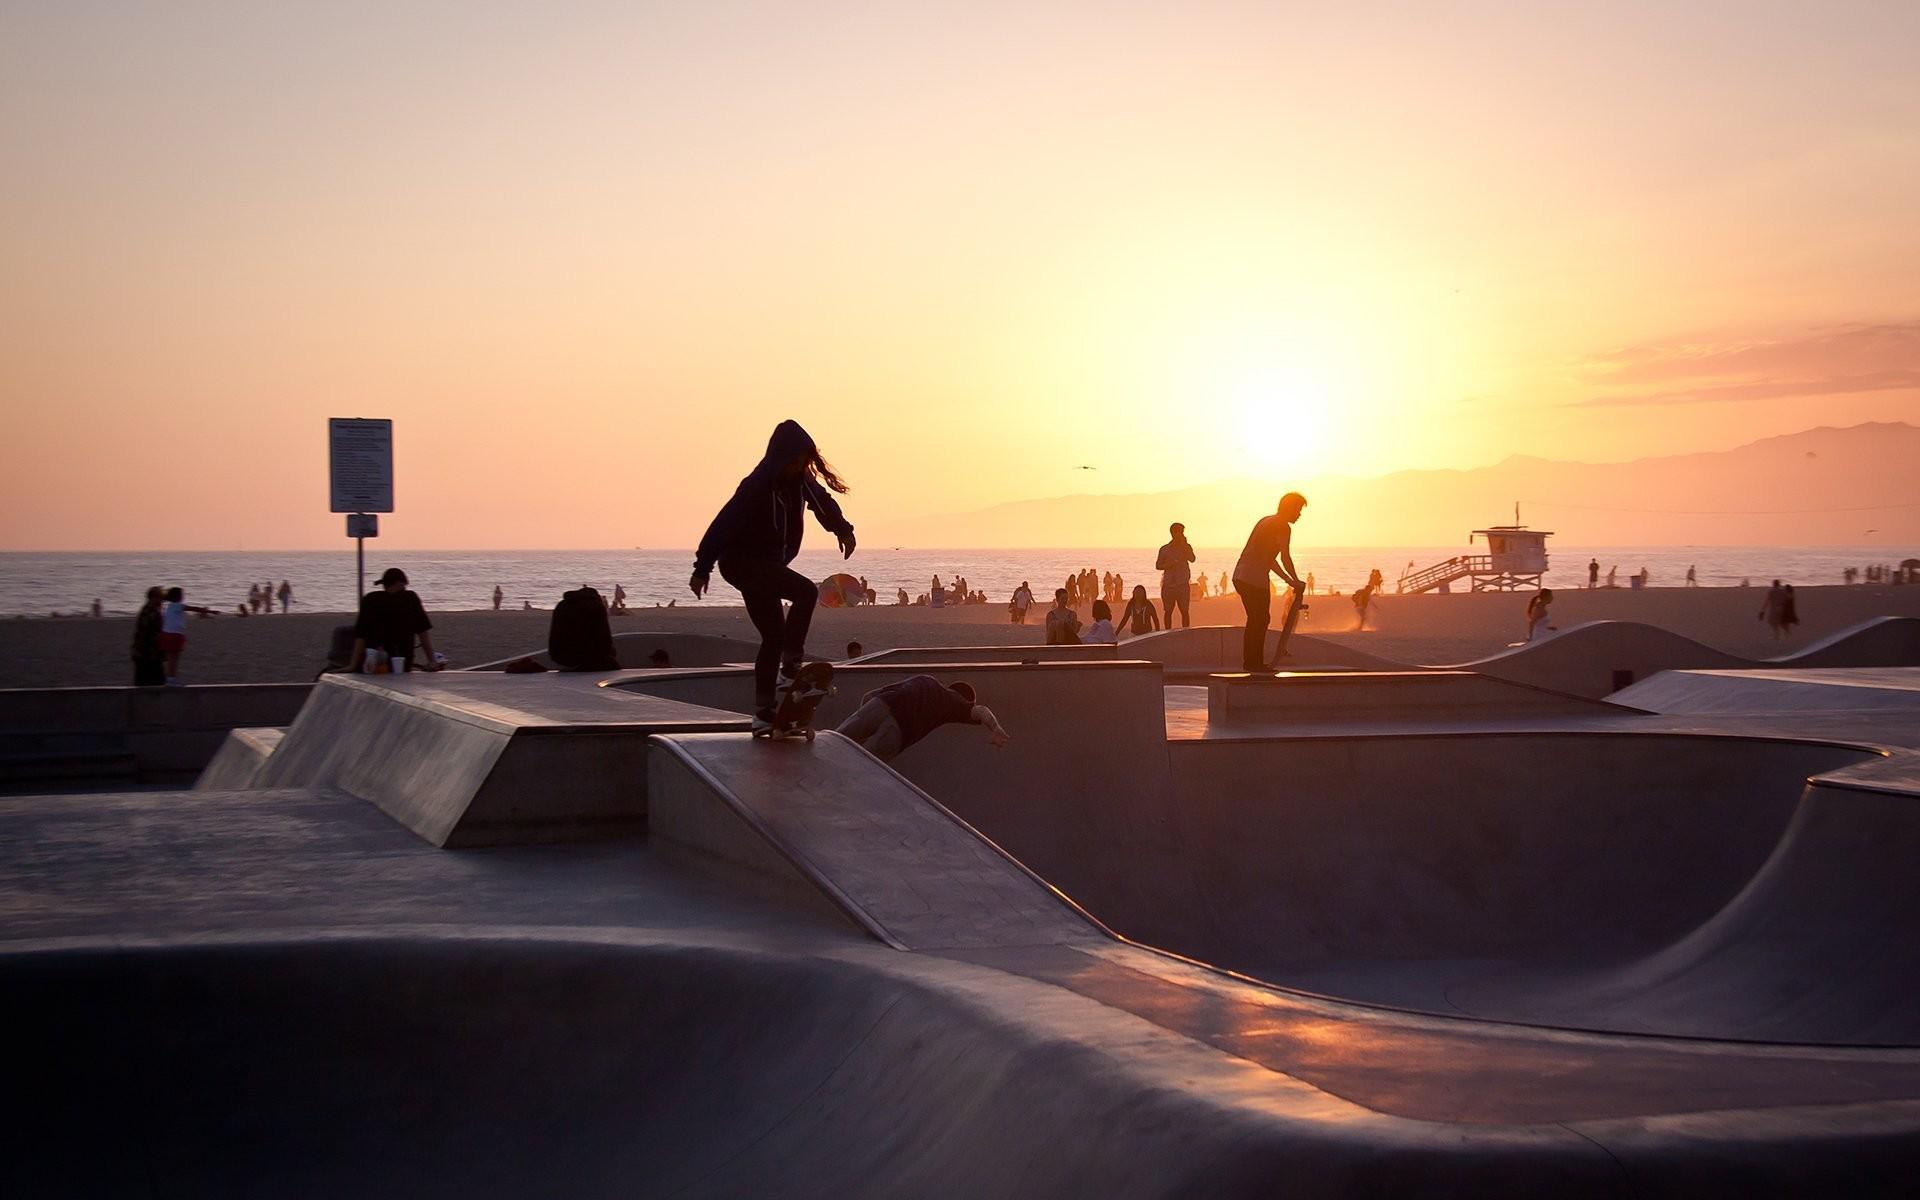 skater venice beach summer sunset la los angeles california usa